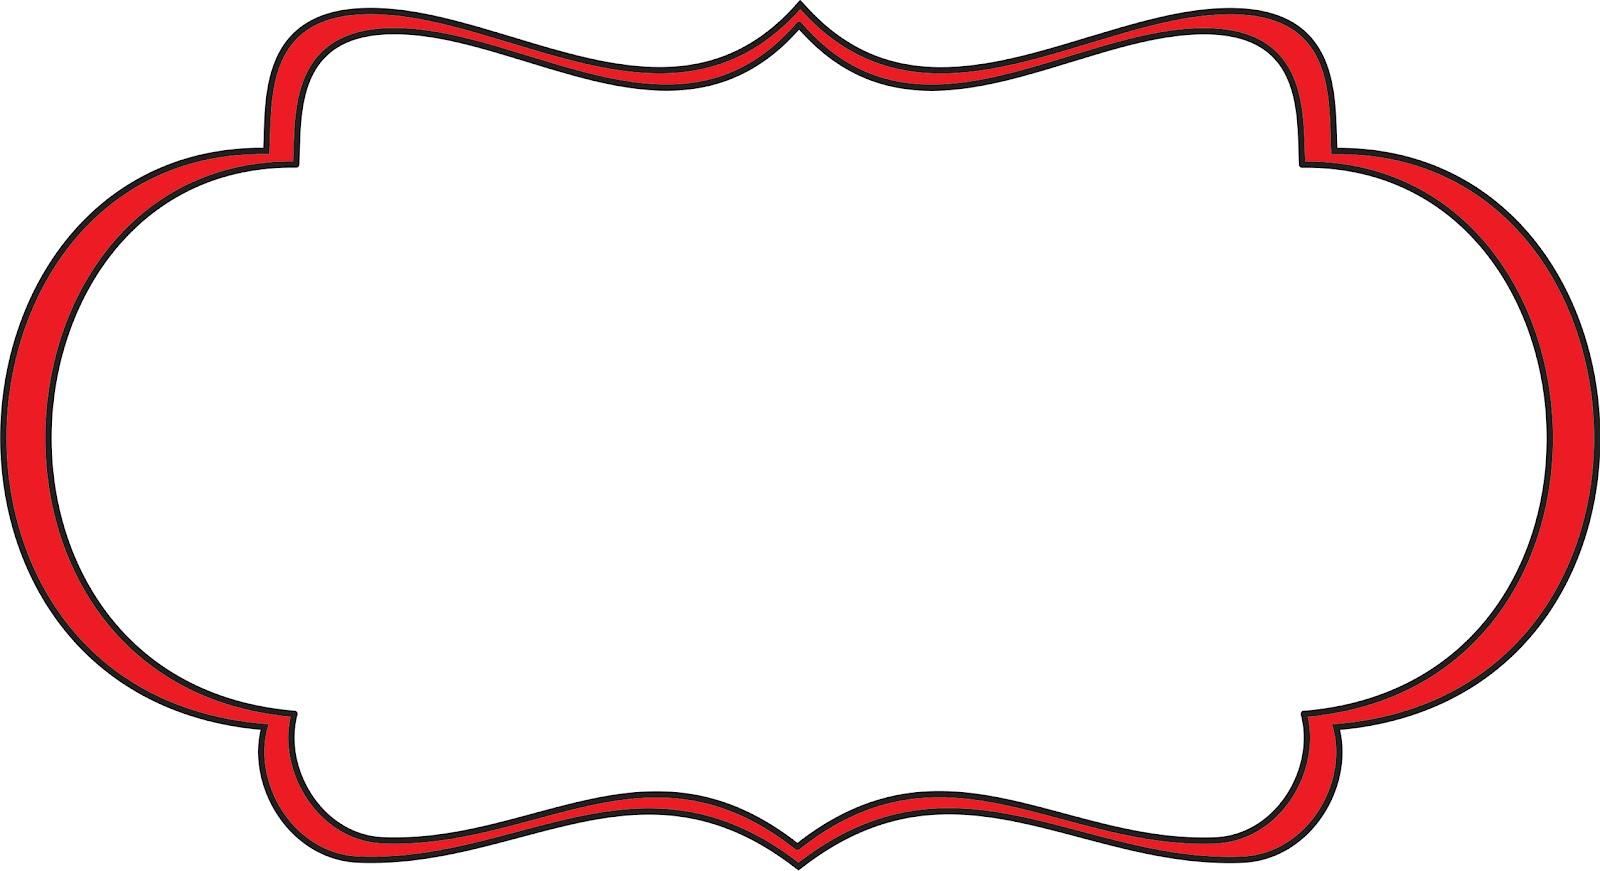 Dr Seuss Border Clip Art free image.